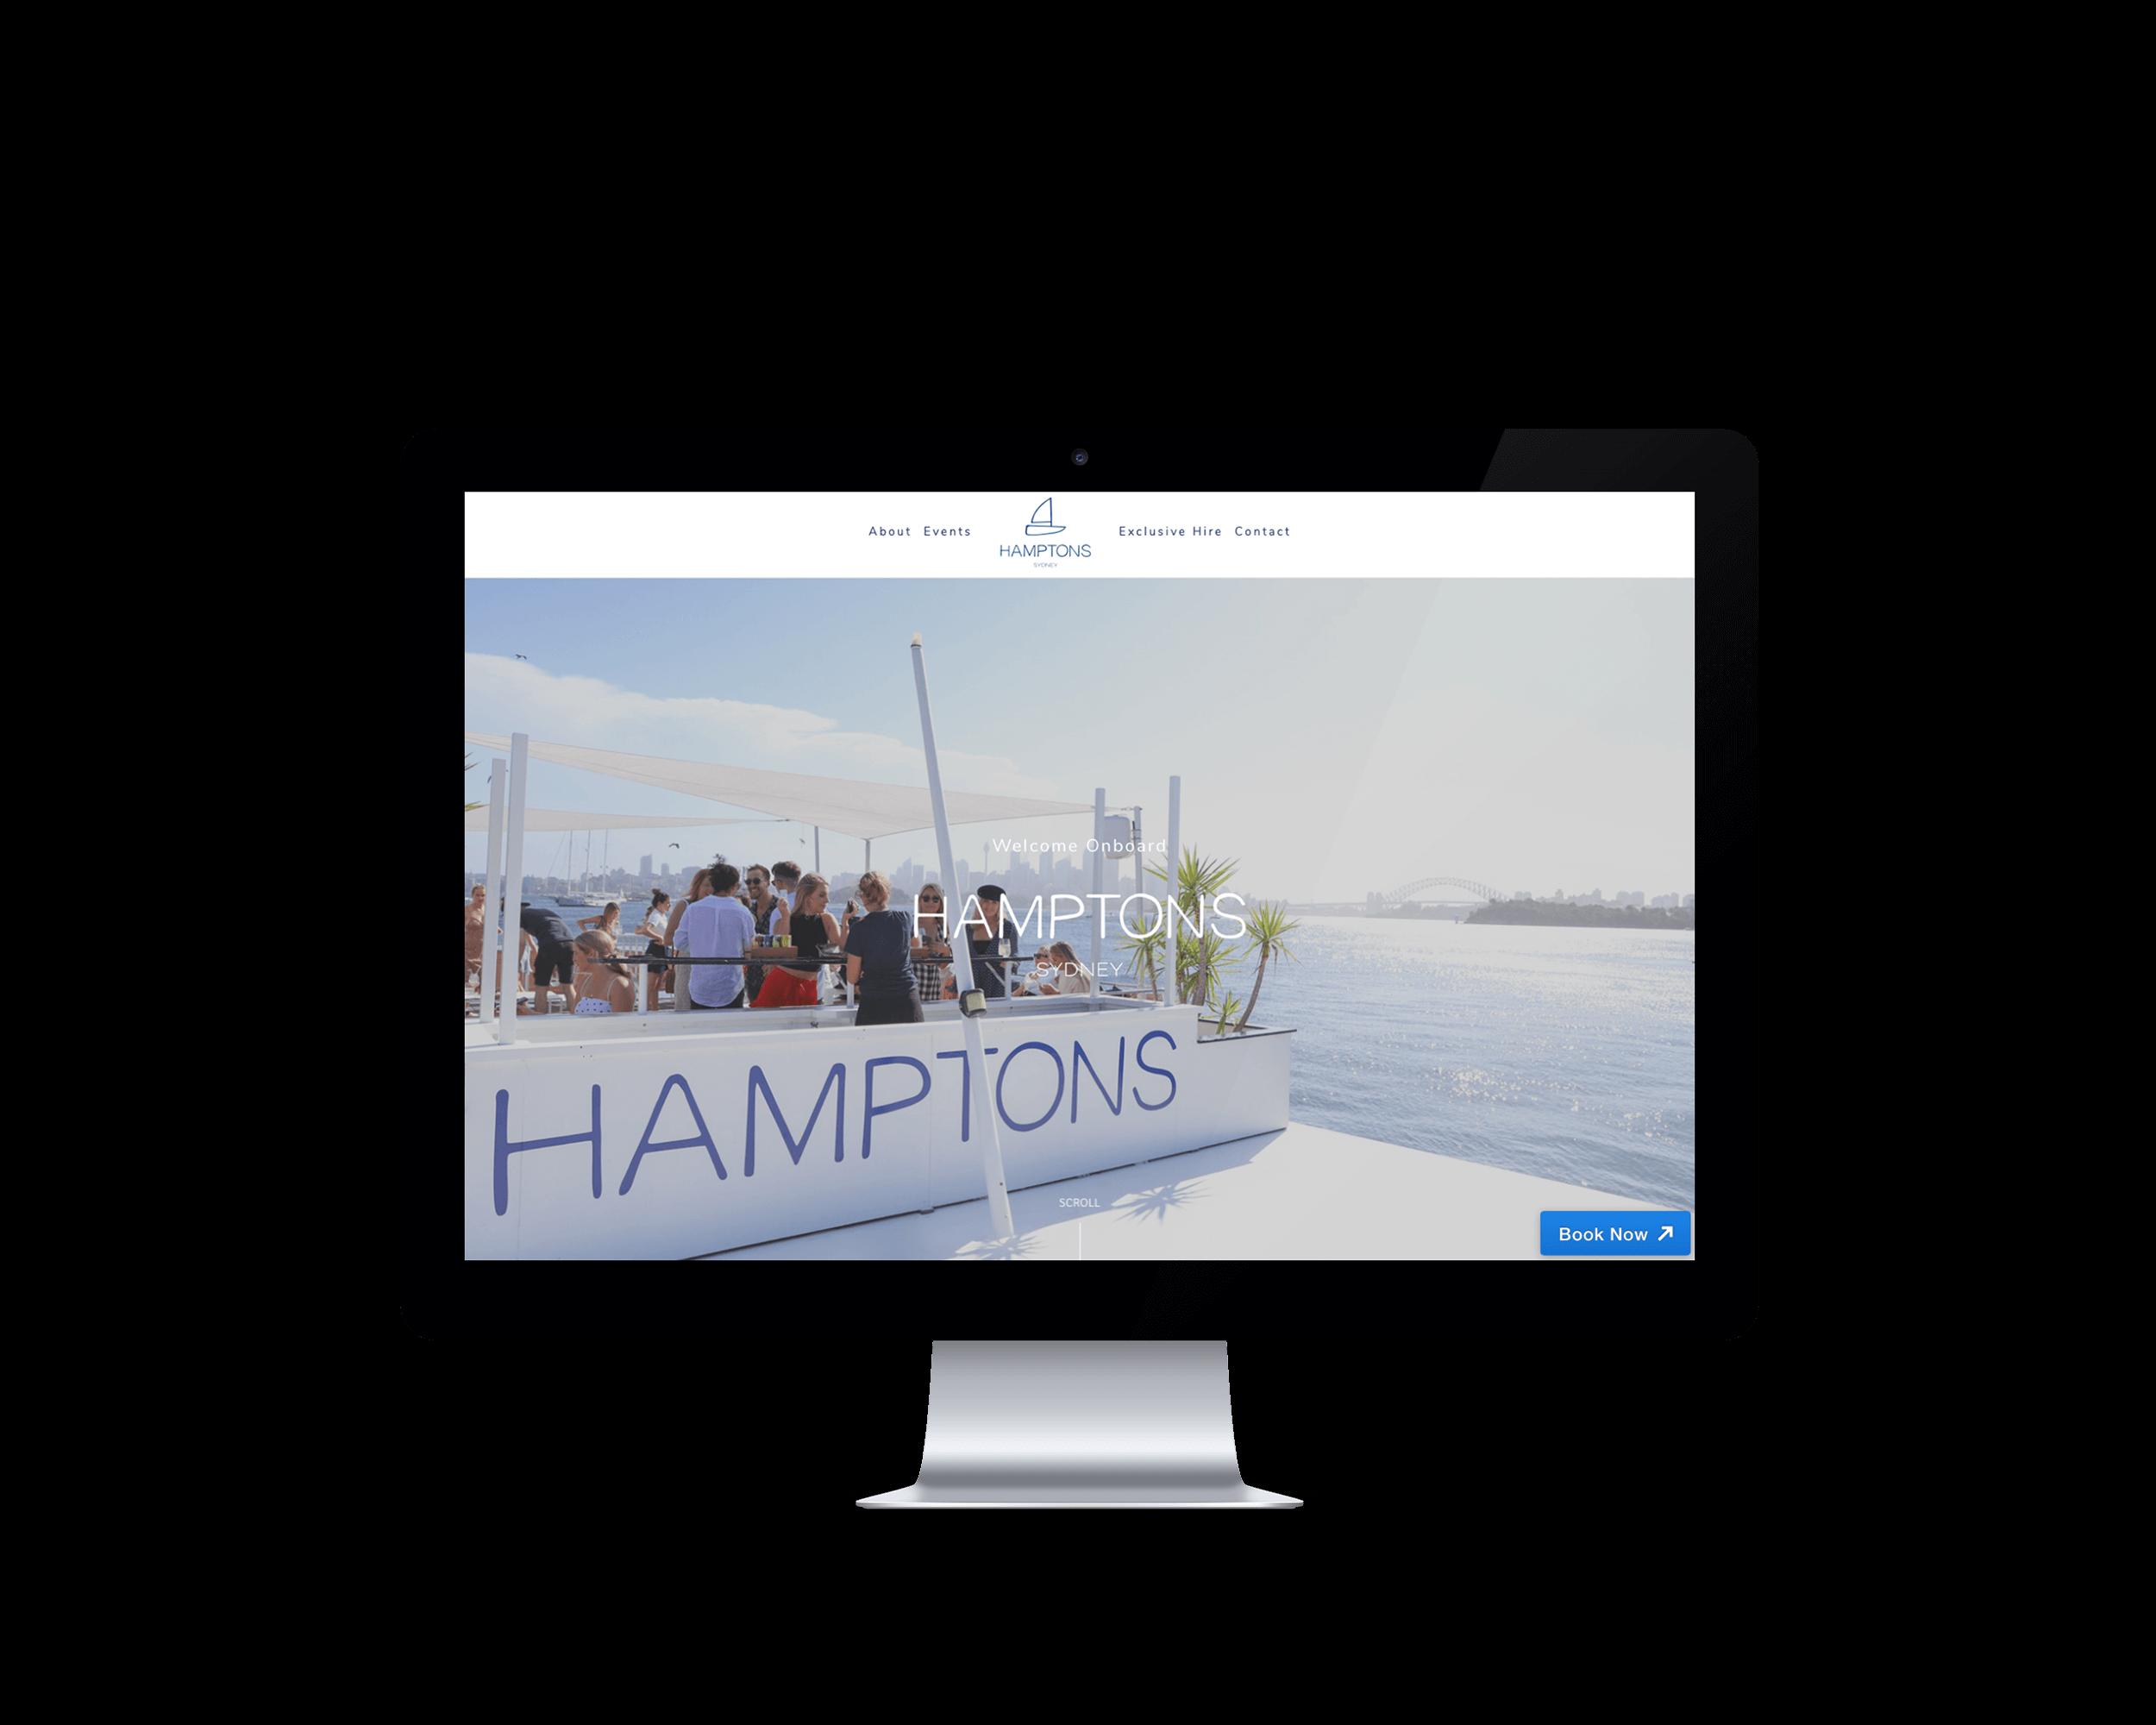 SlickWeb_Work_Hamptons.png